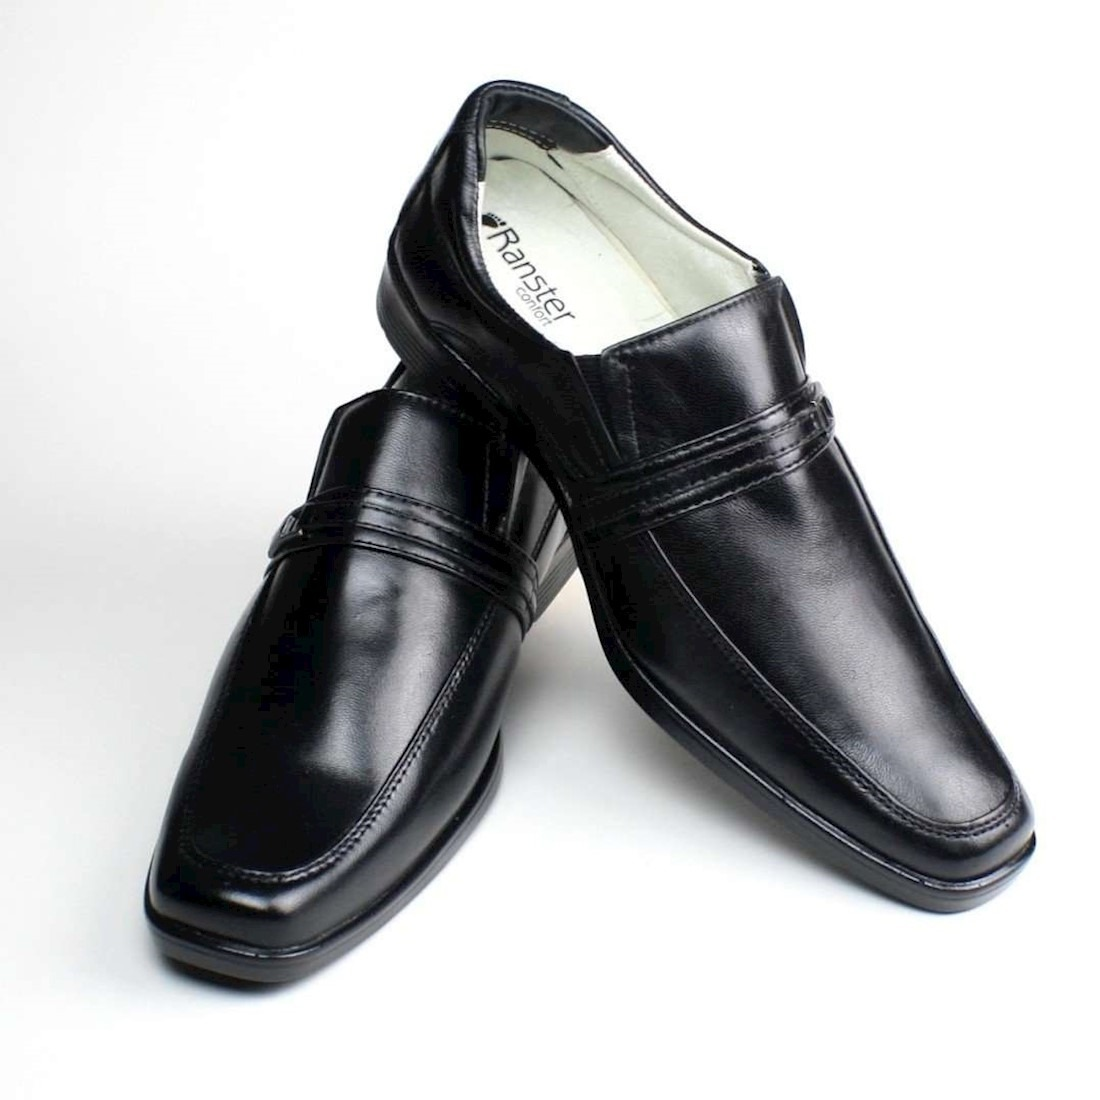 6486de0e1 sapato social couro anti stress confort. Carregando zoom.